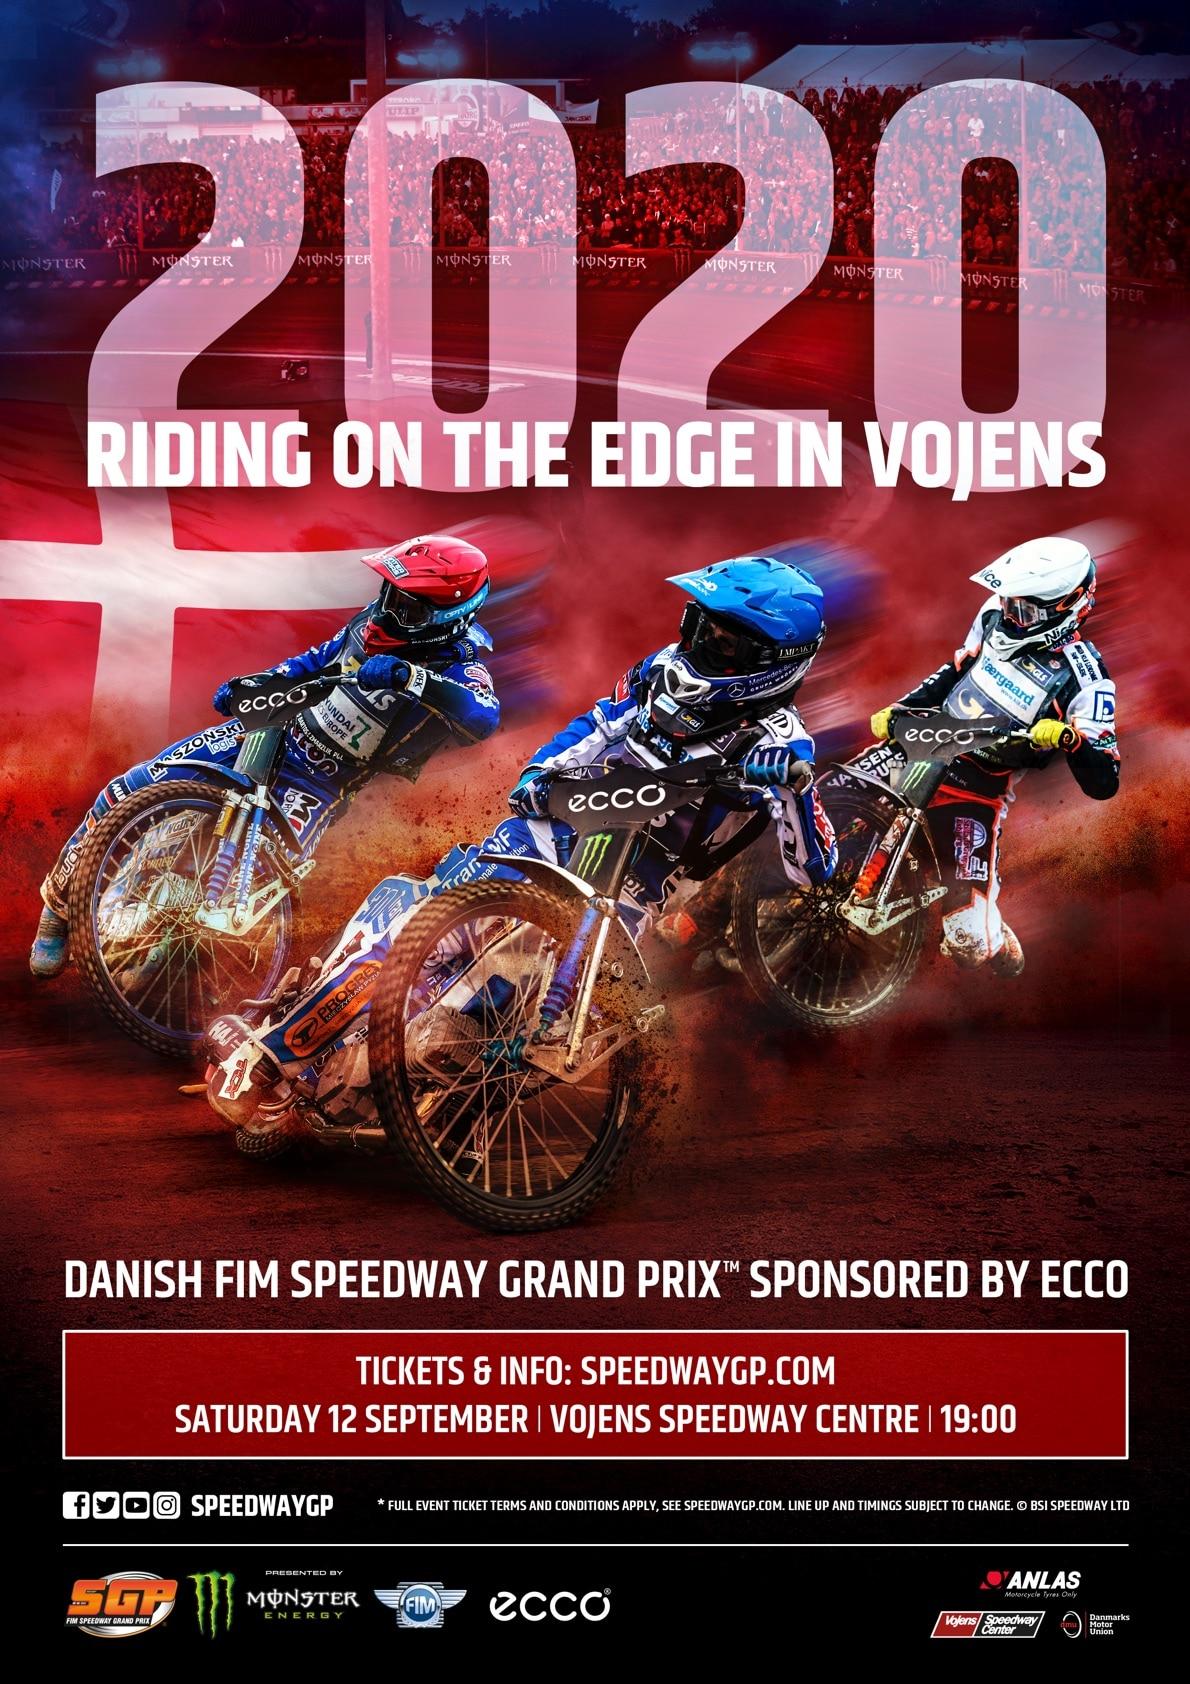 2020 Danish FIM Speedway Grand Prix Sponsored By ECCO